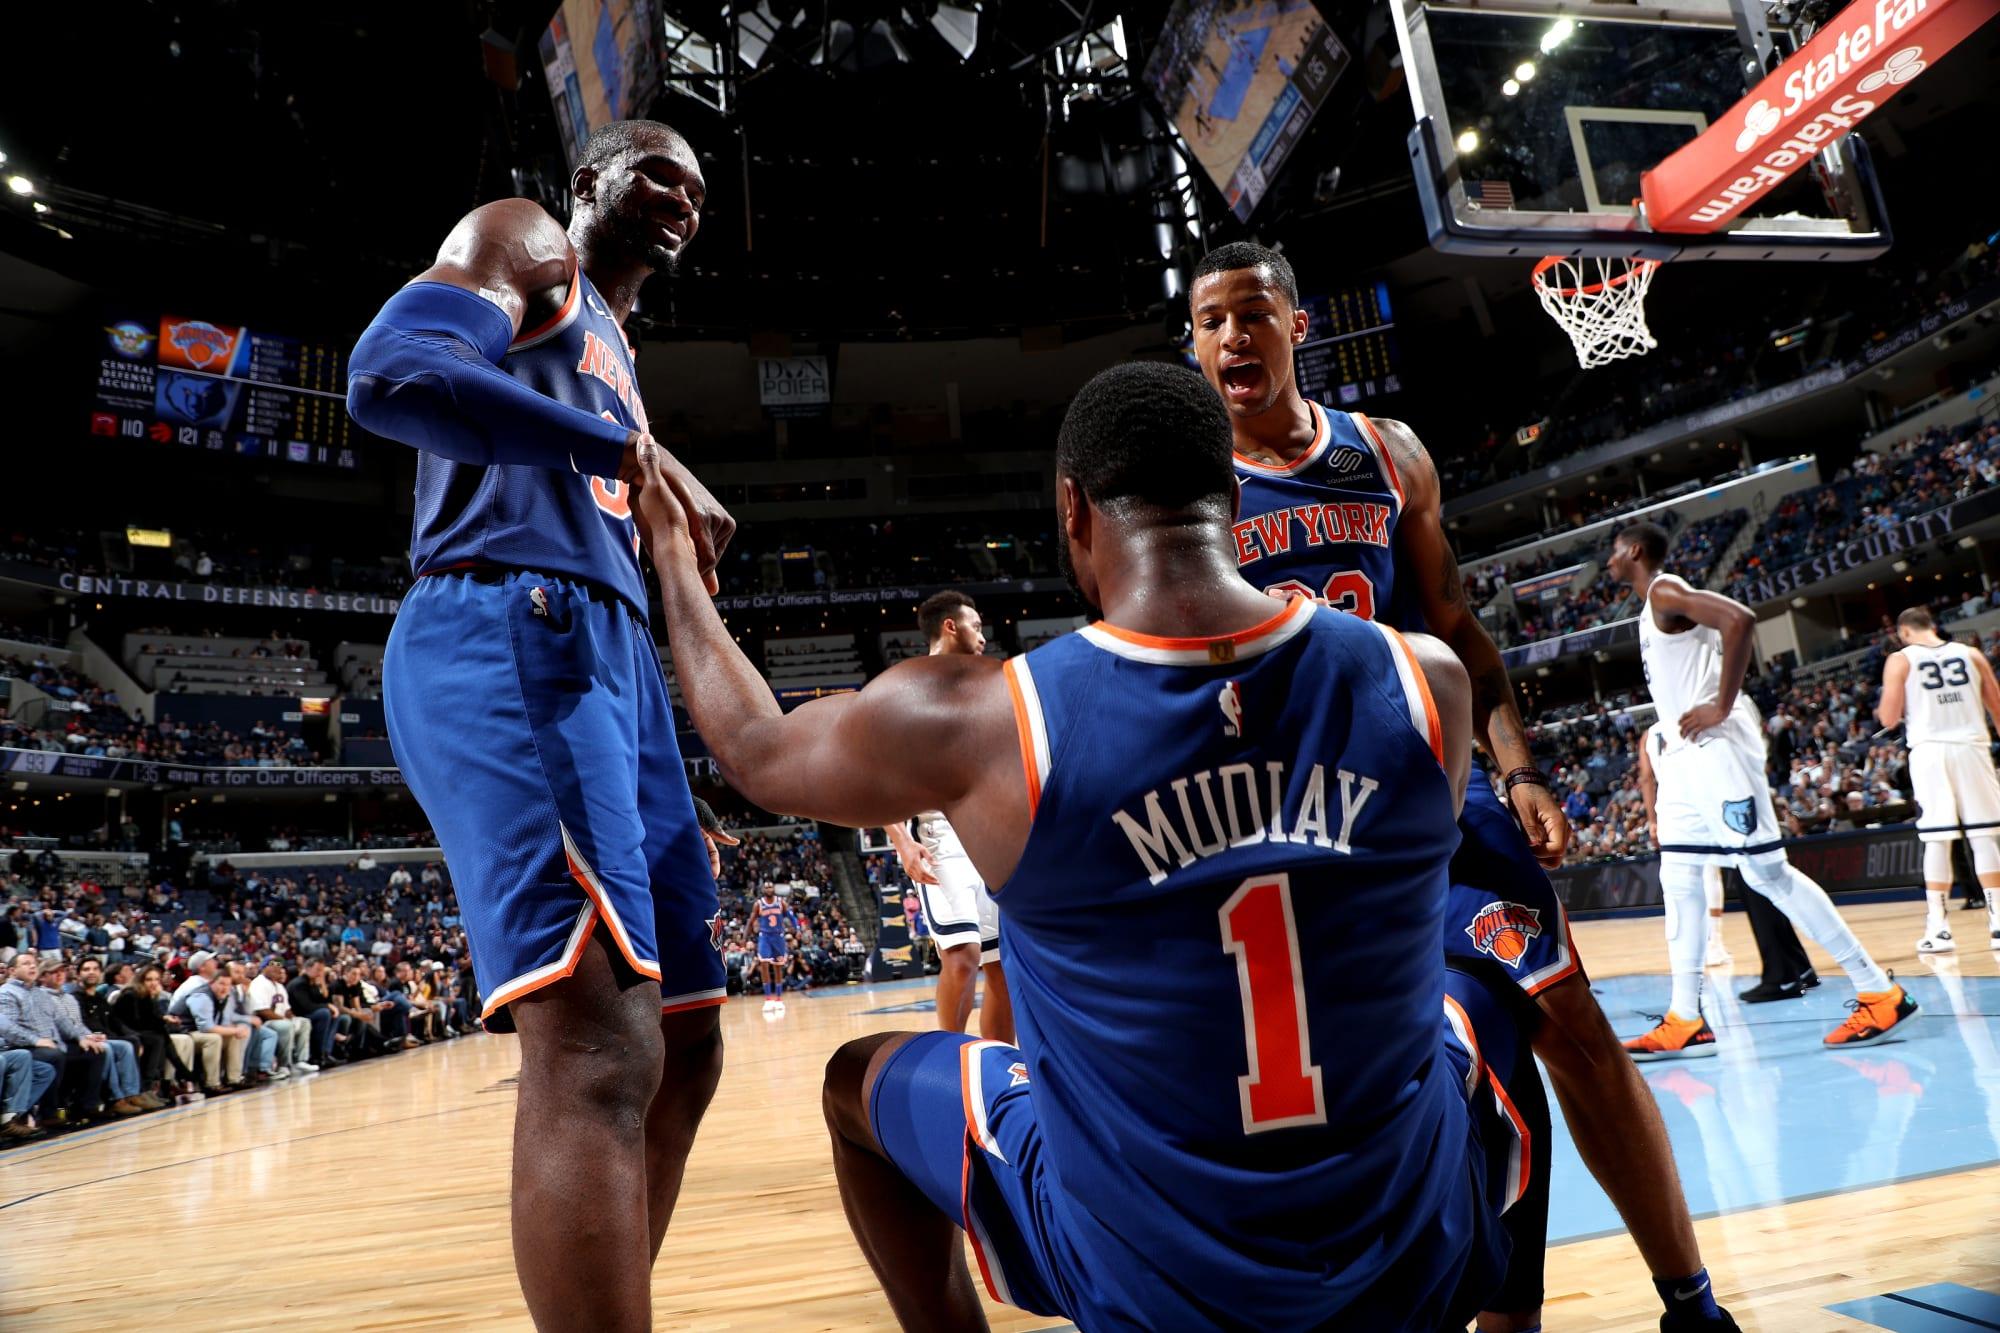 New York Knicks #32 Noah Vonleh City Jersey and Pant Set